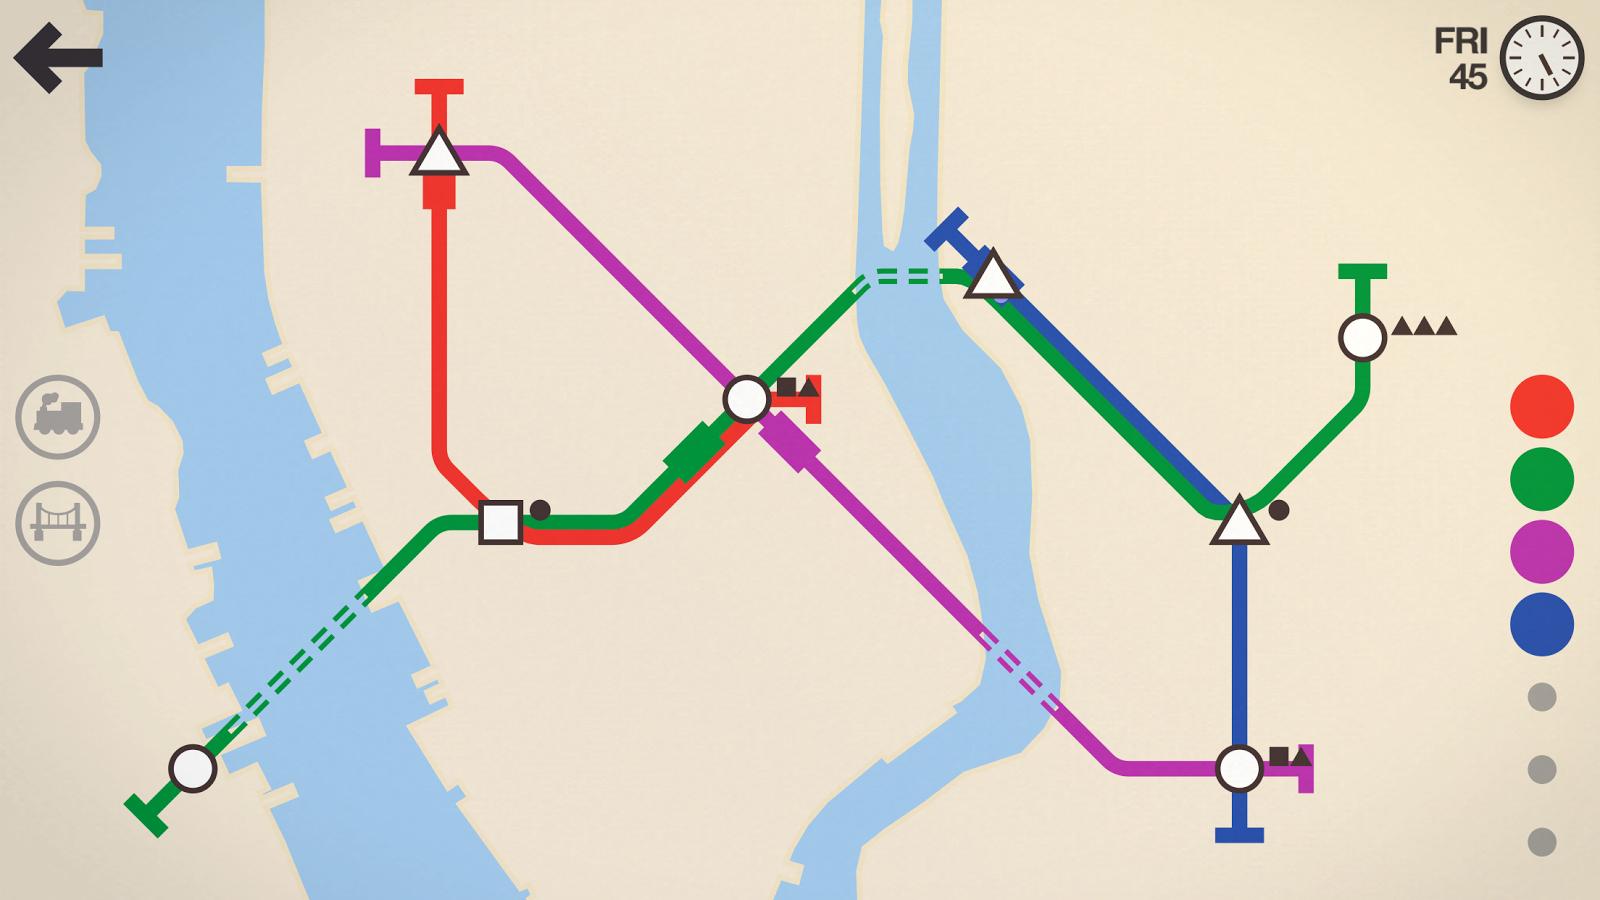 [Android] Mini Metro - U-Bahn-Simulator für 1,99€ statt 4,99€